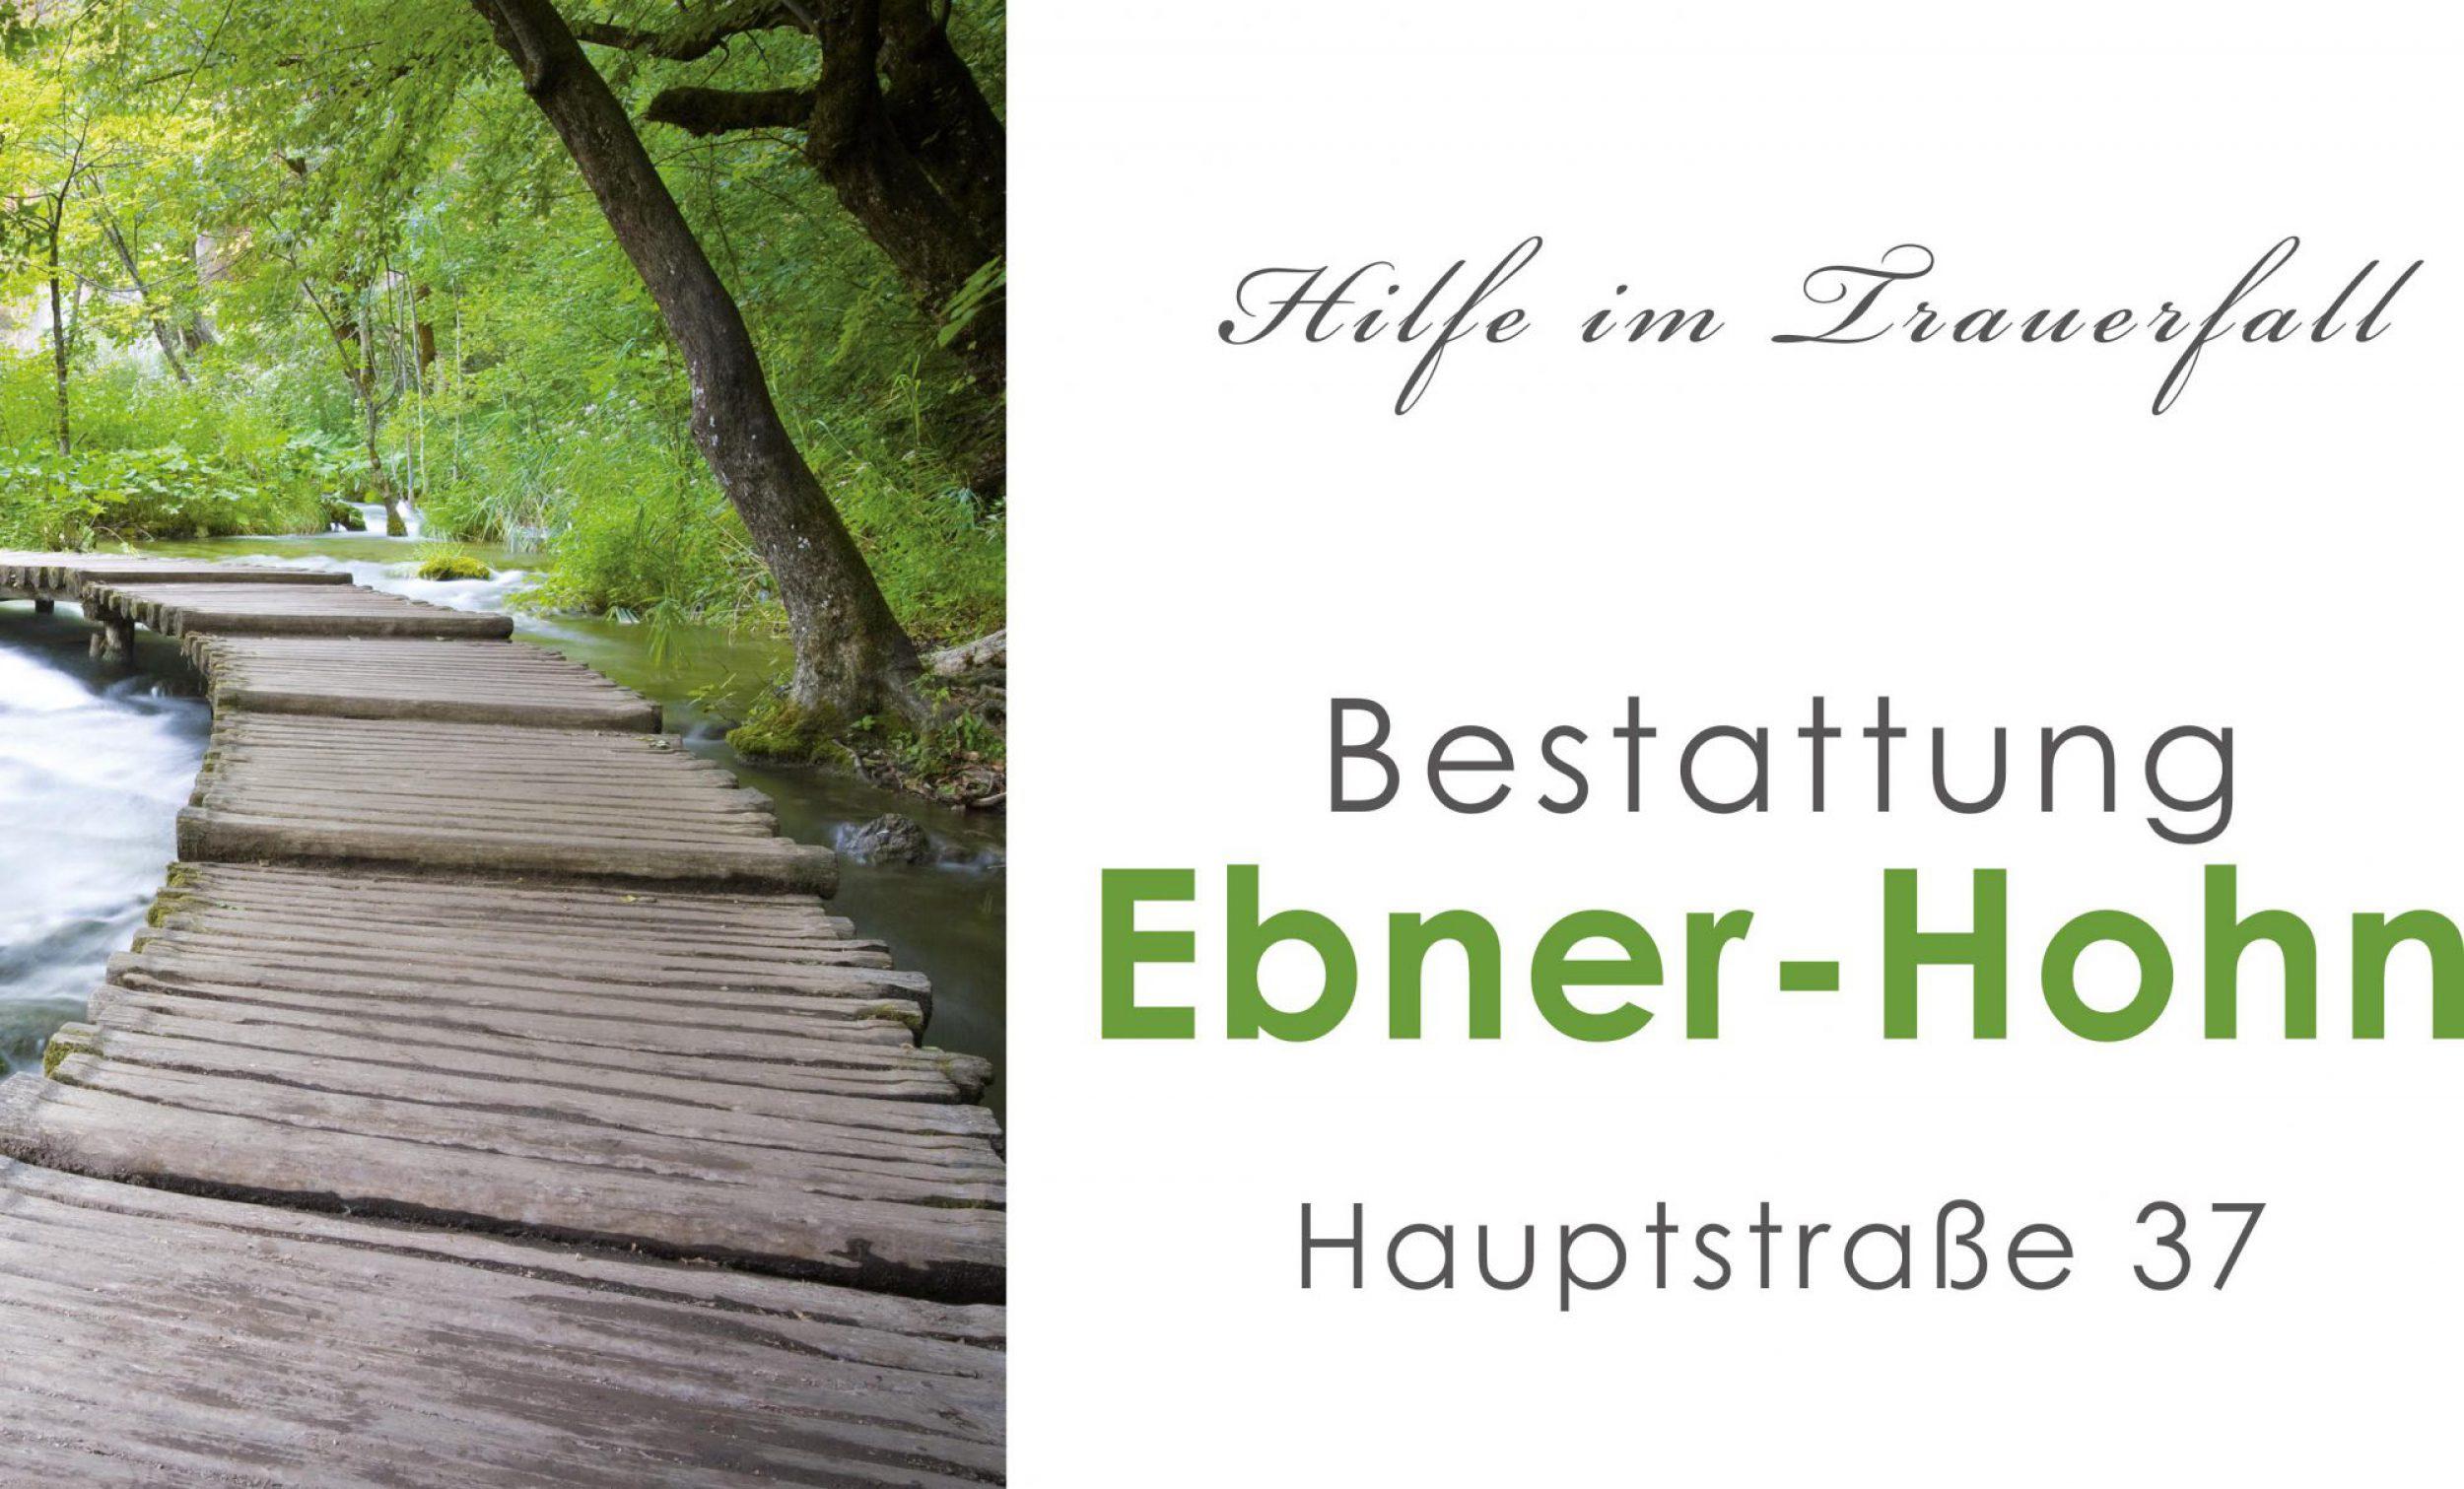 Bestattung Ebner-Hohn